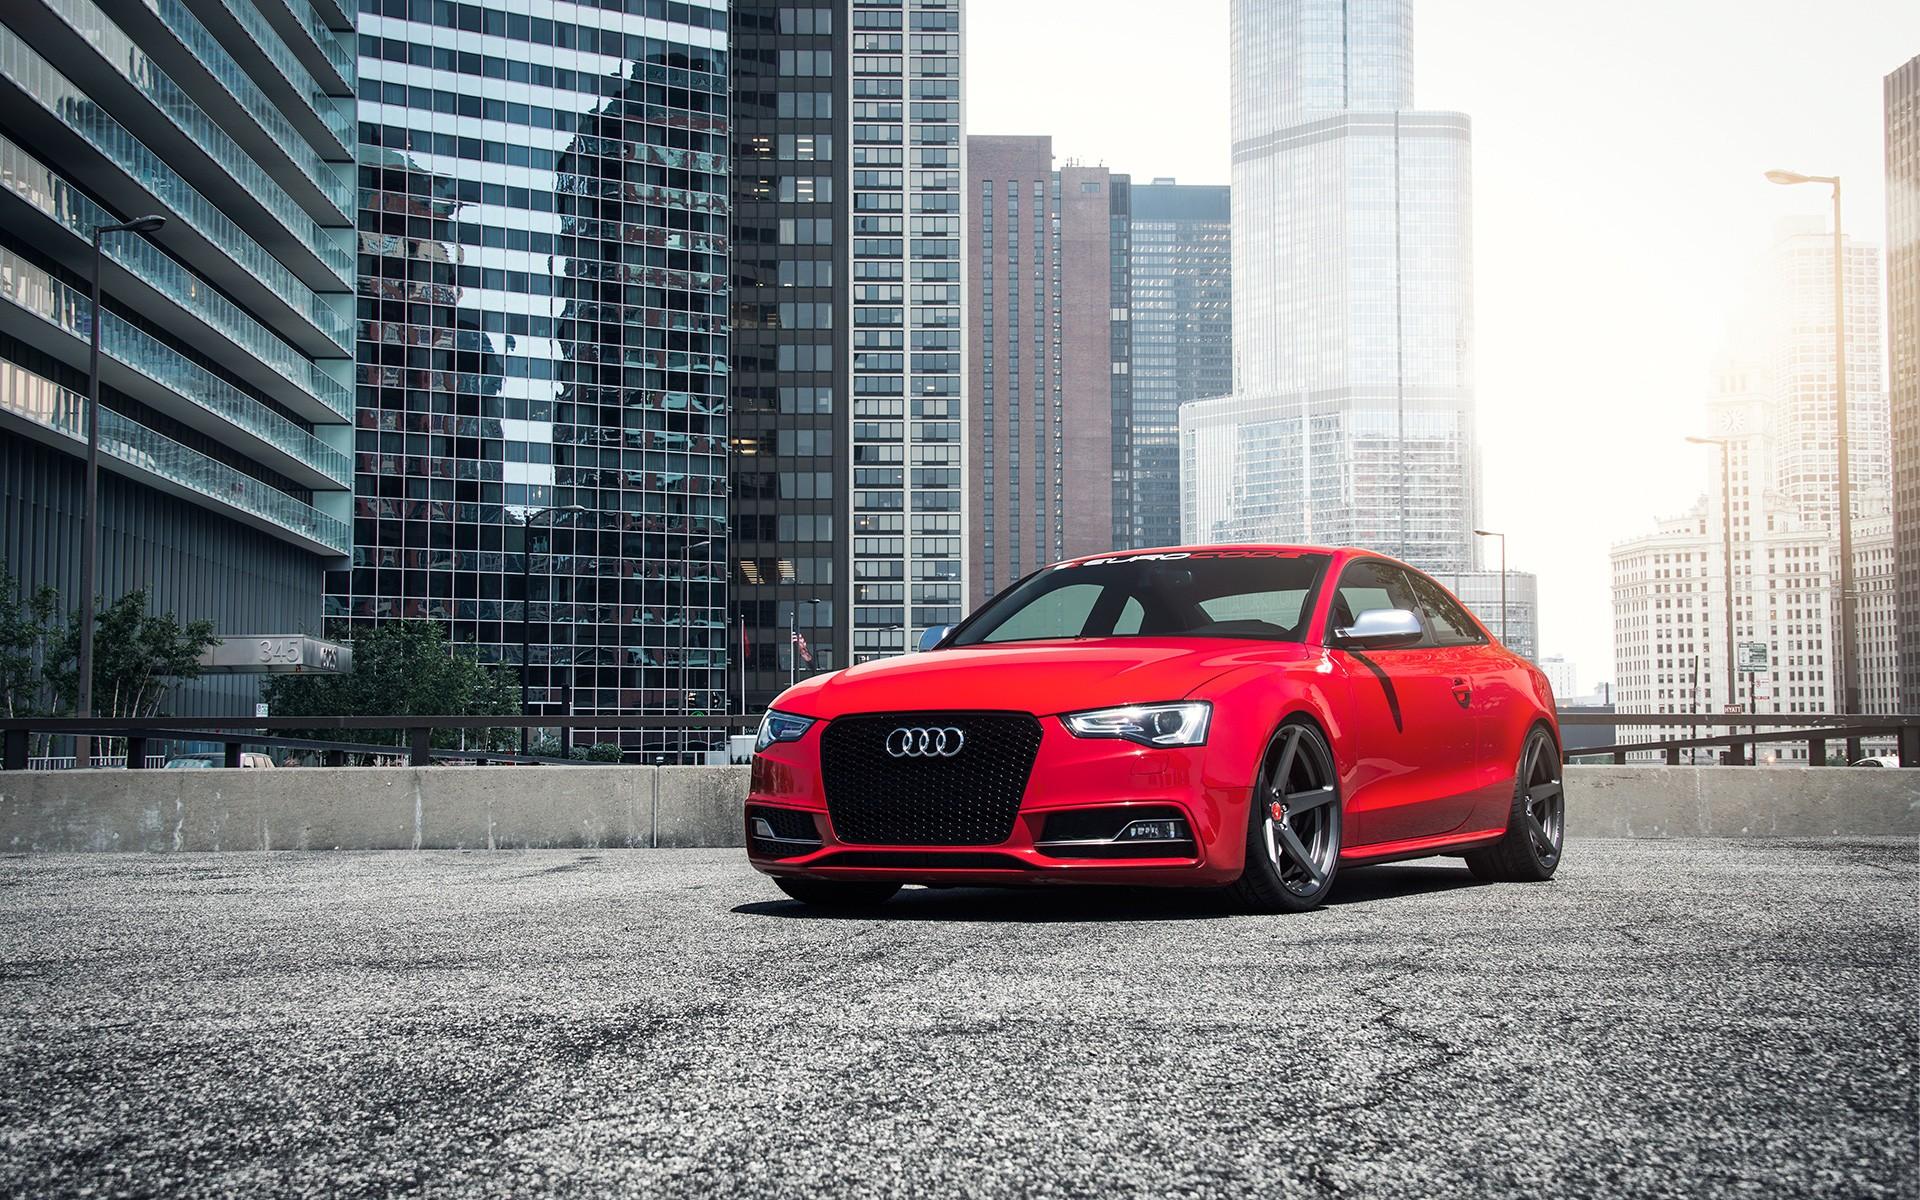 Cars Wallpapers: Eurocode Tuning Audi Wallpaper